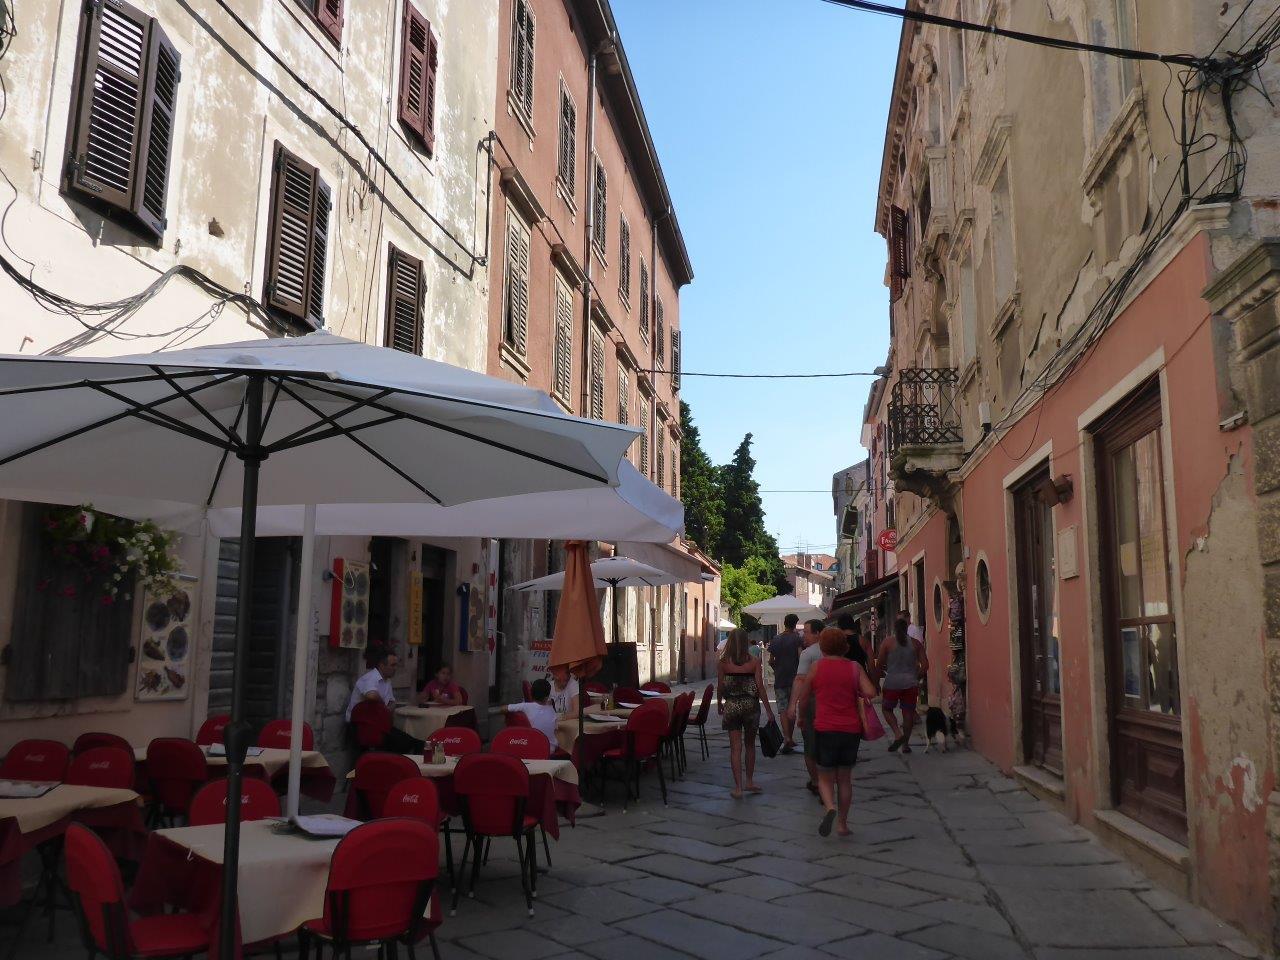 Pula Croatia Streets Street in Old Town Pula